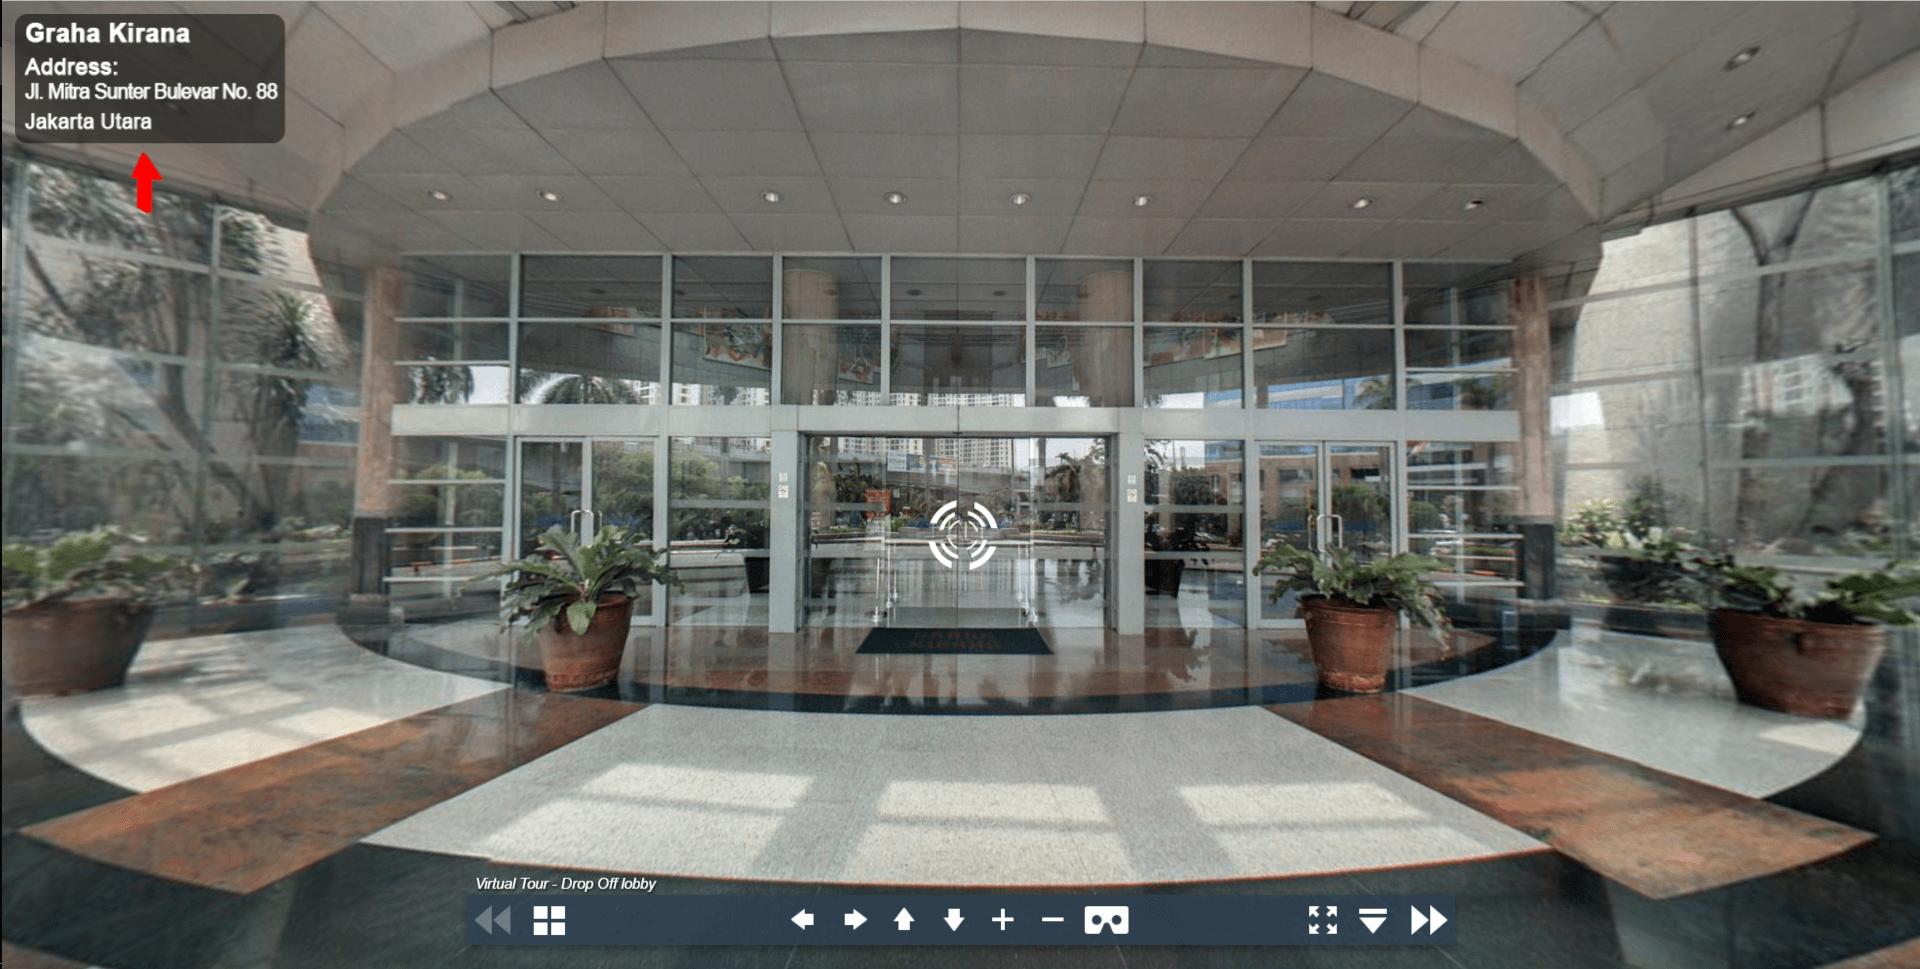 Sewa Kantor Gedung Graha Kirana Jakarta Utara Tanjung Priok  Jakarta Virtual Reality